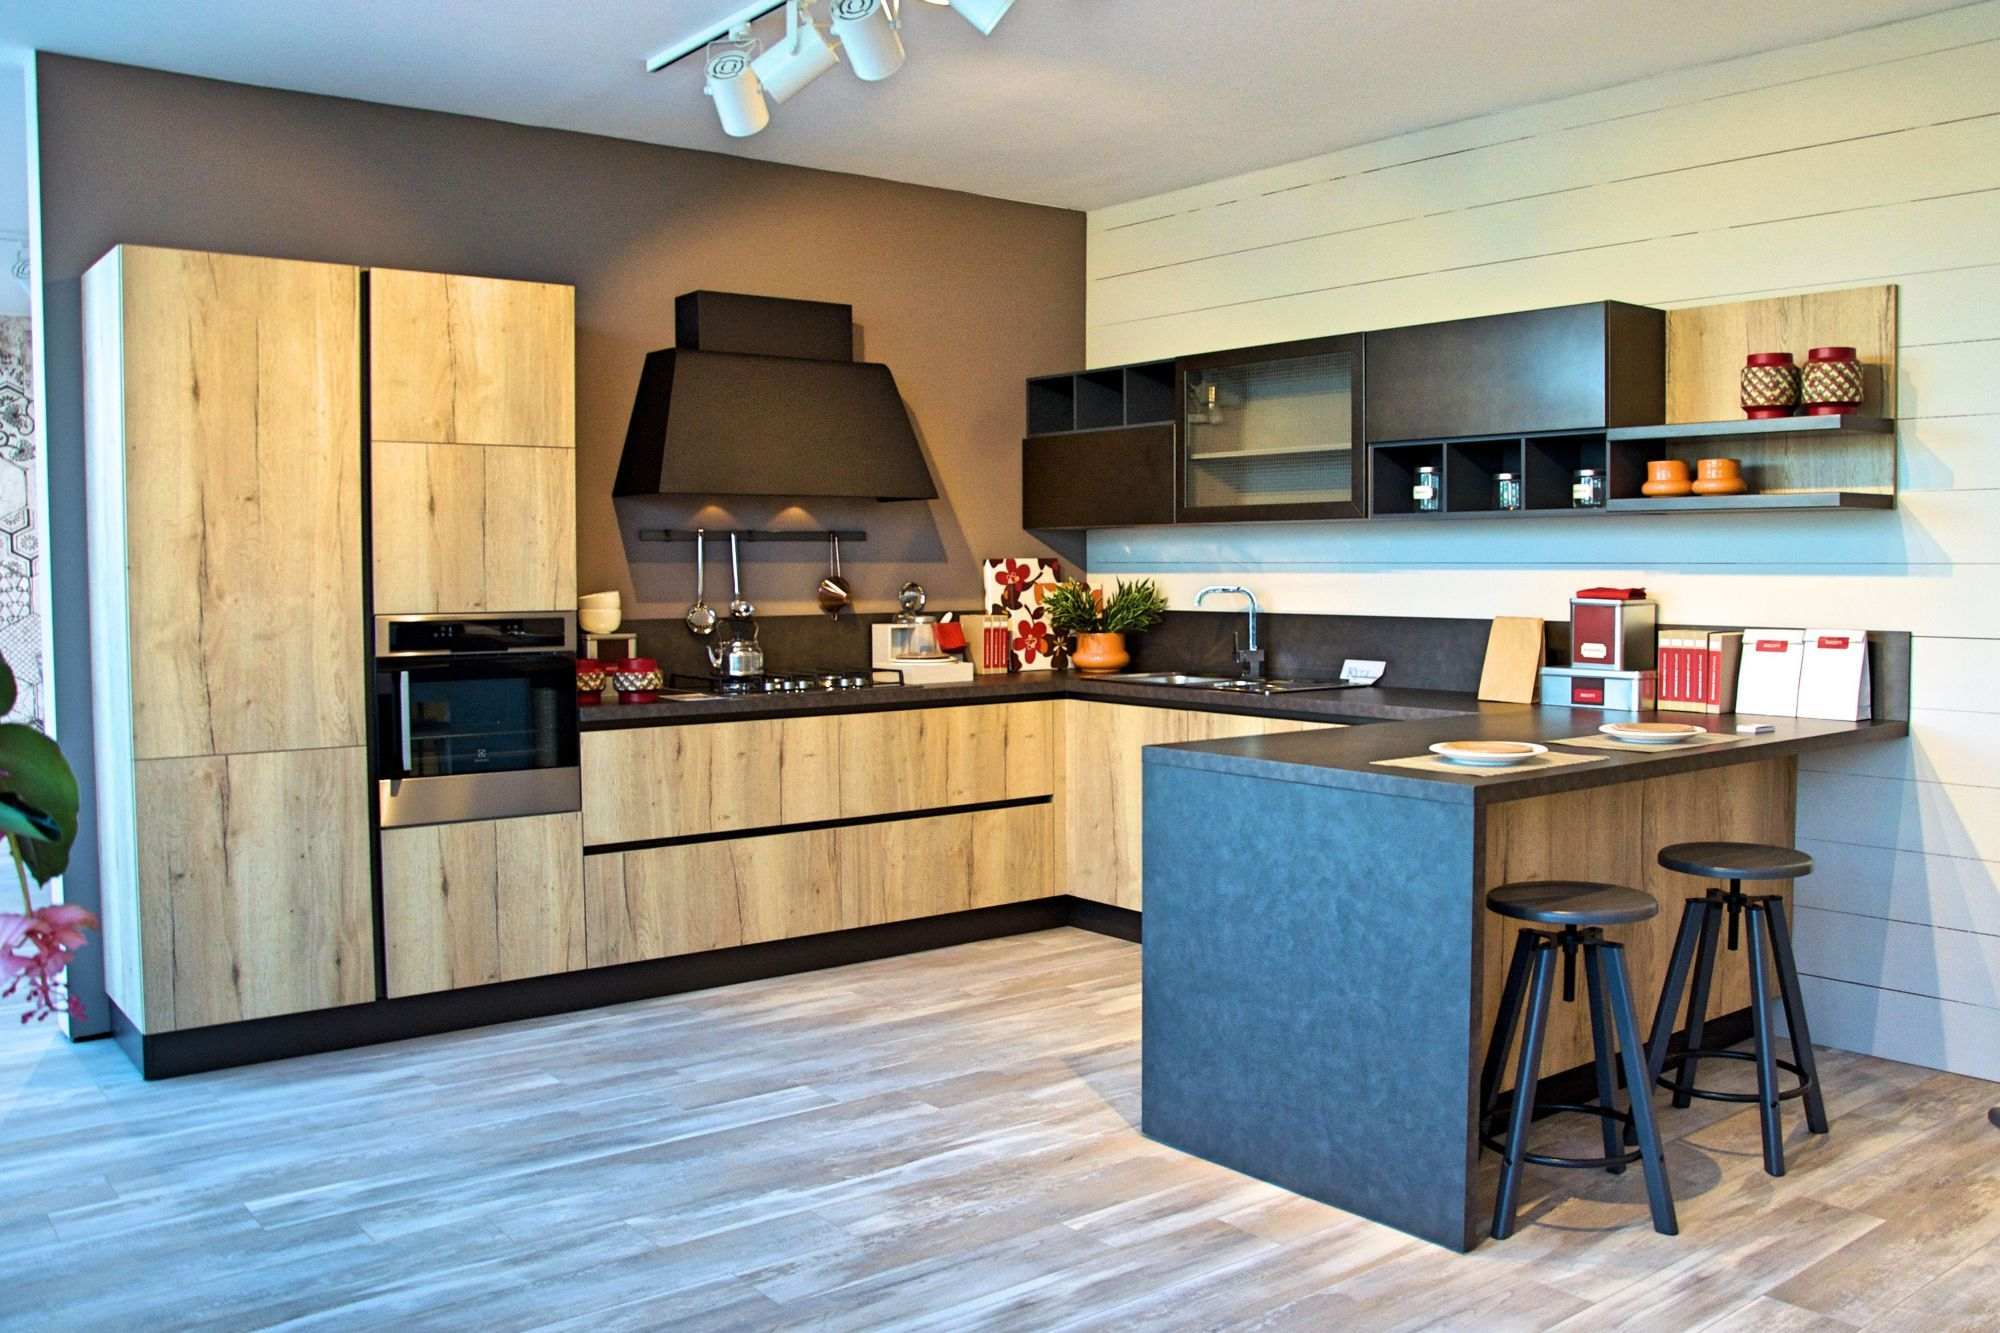 Il Gruppo Lube apre Creo Kitchens Store a Sassari - Creo Kitchens ...